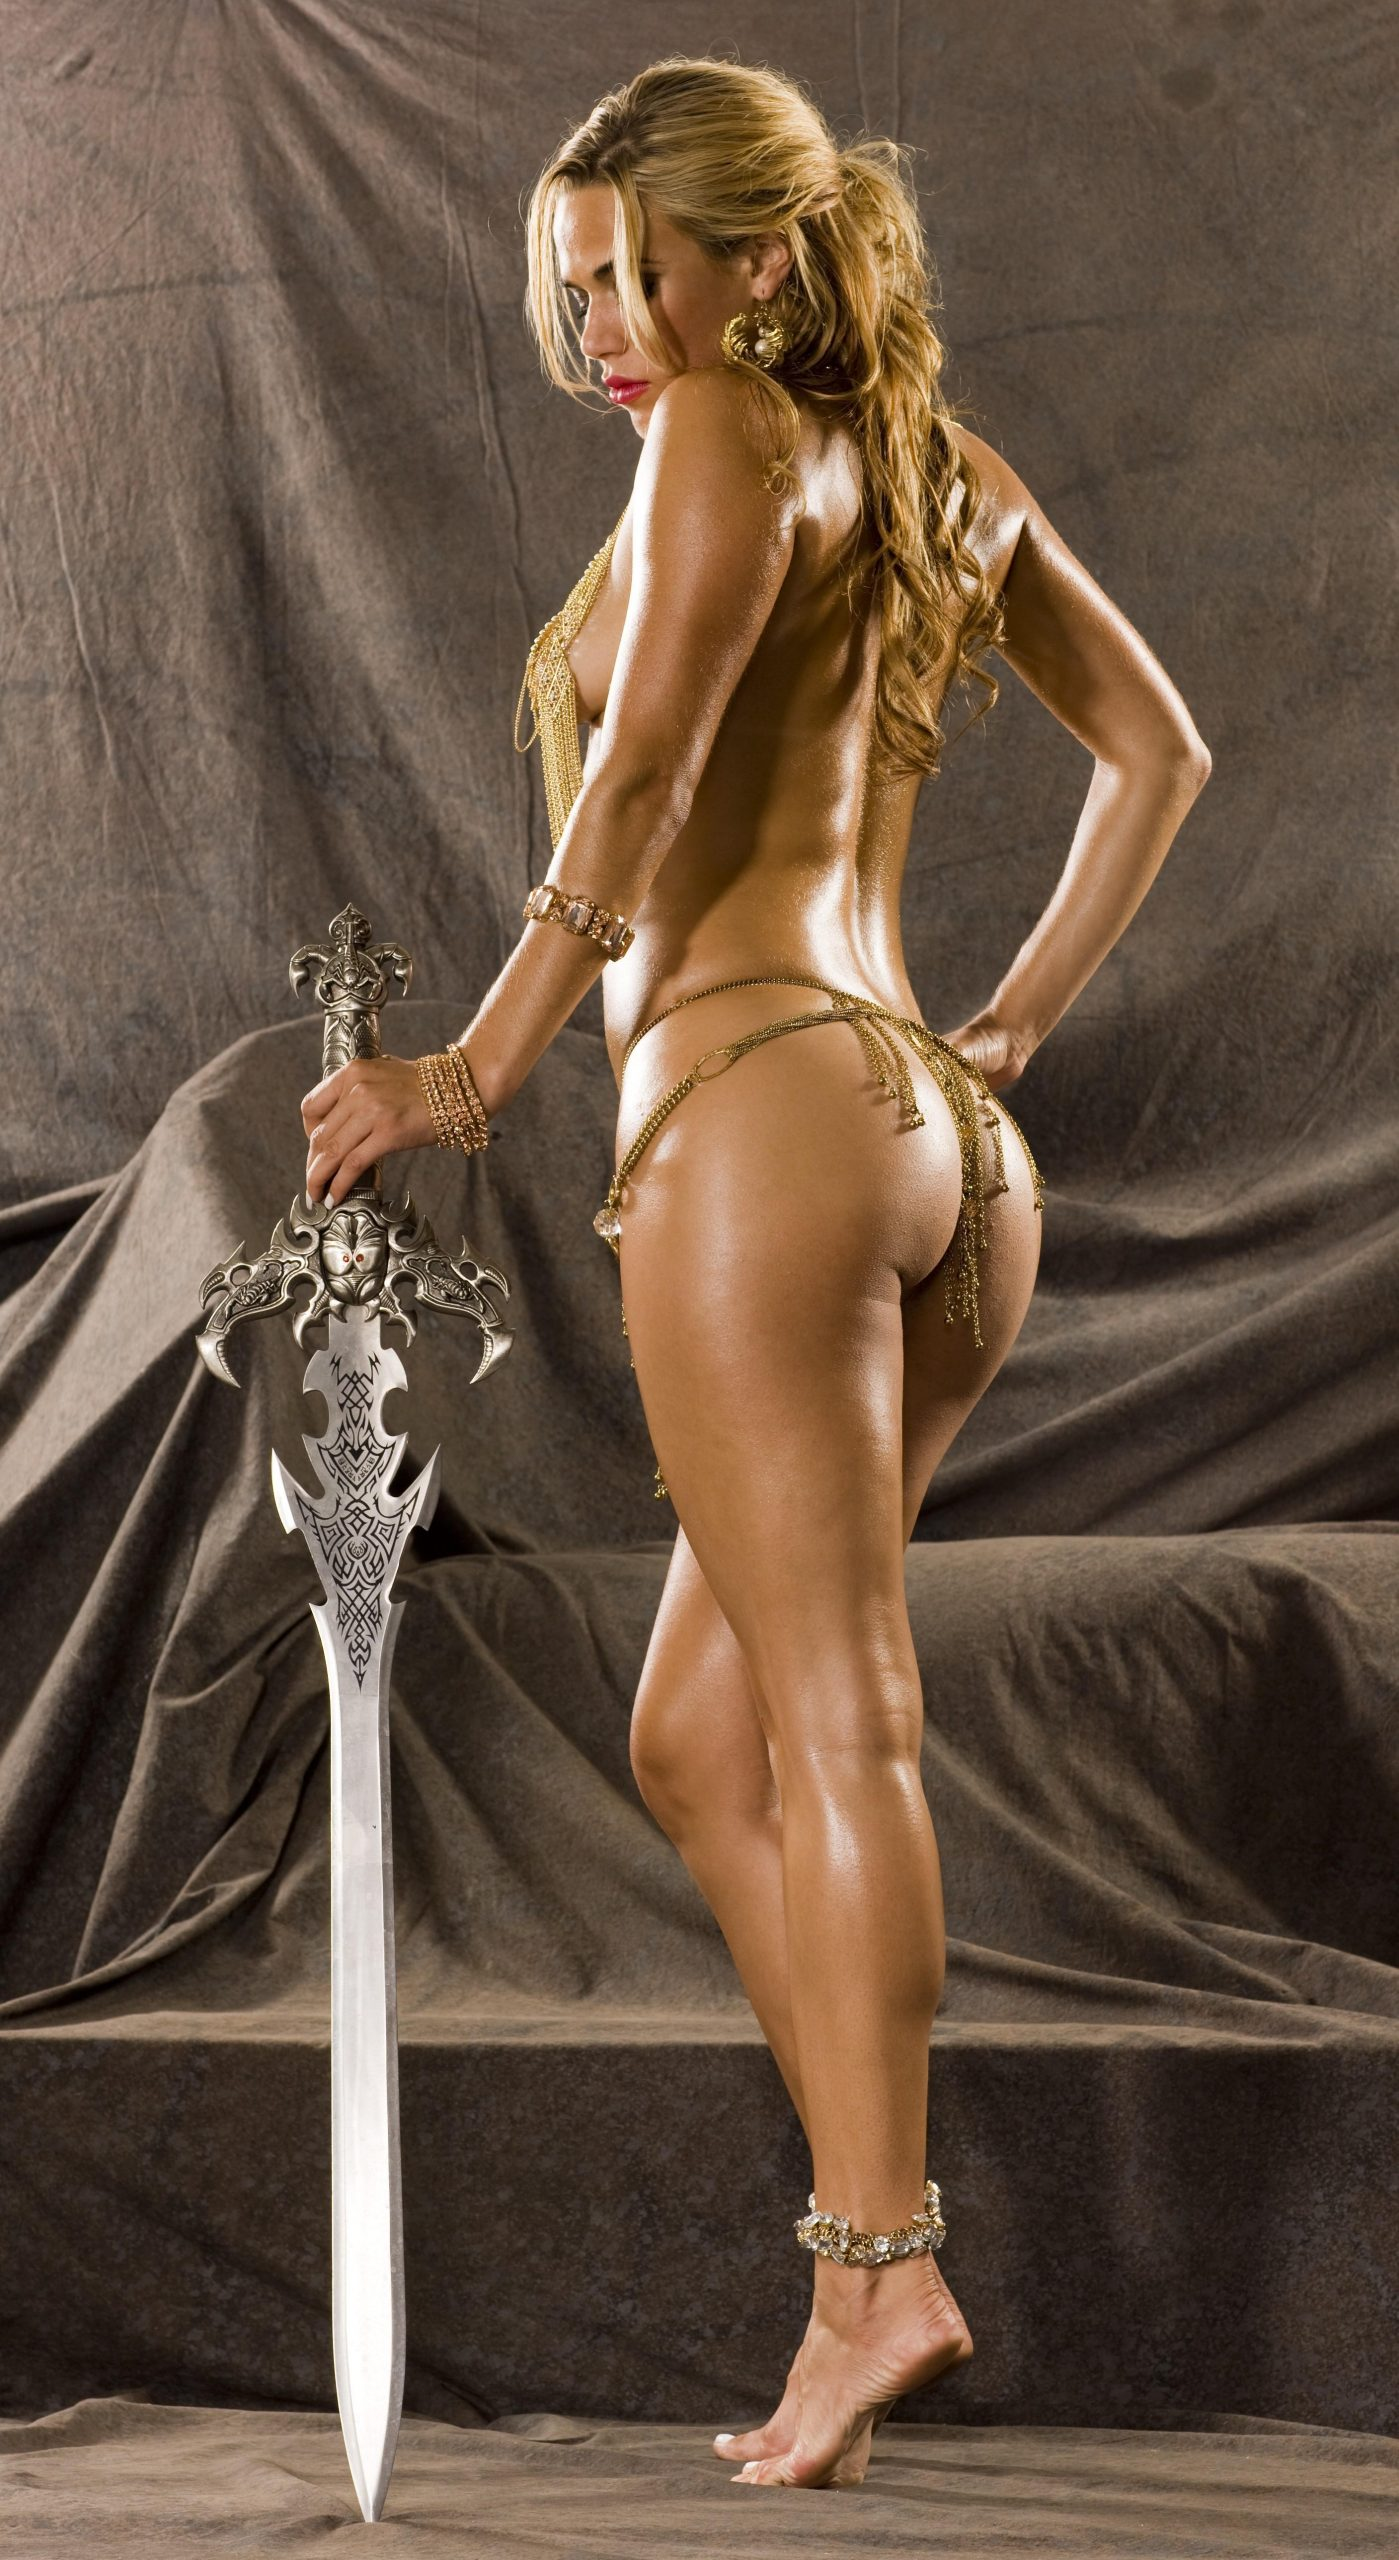 Lana sexy butt pic